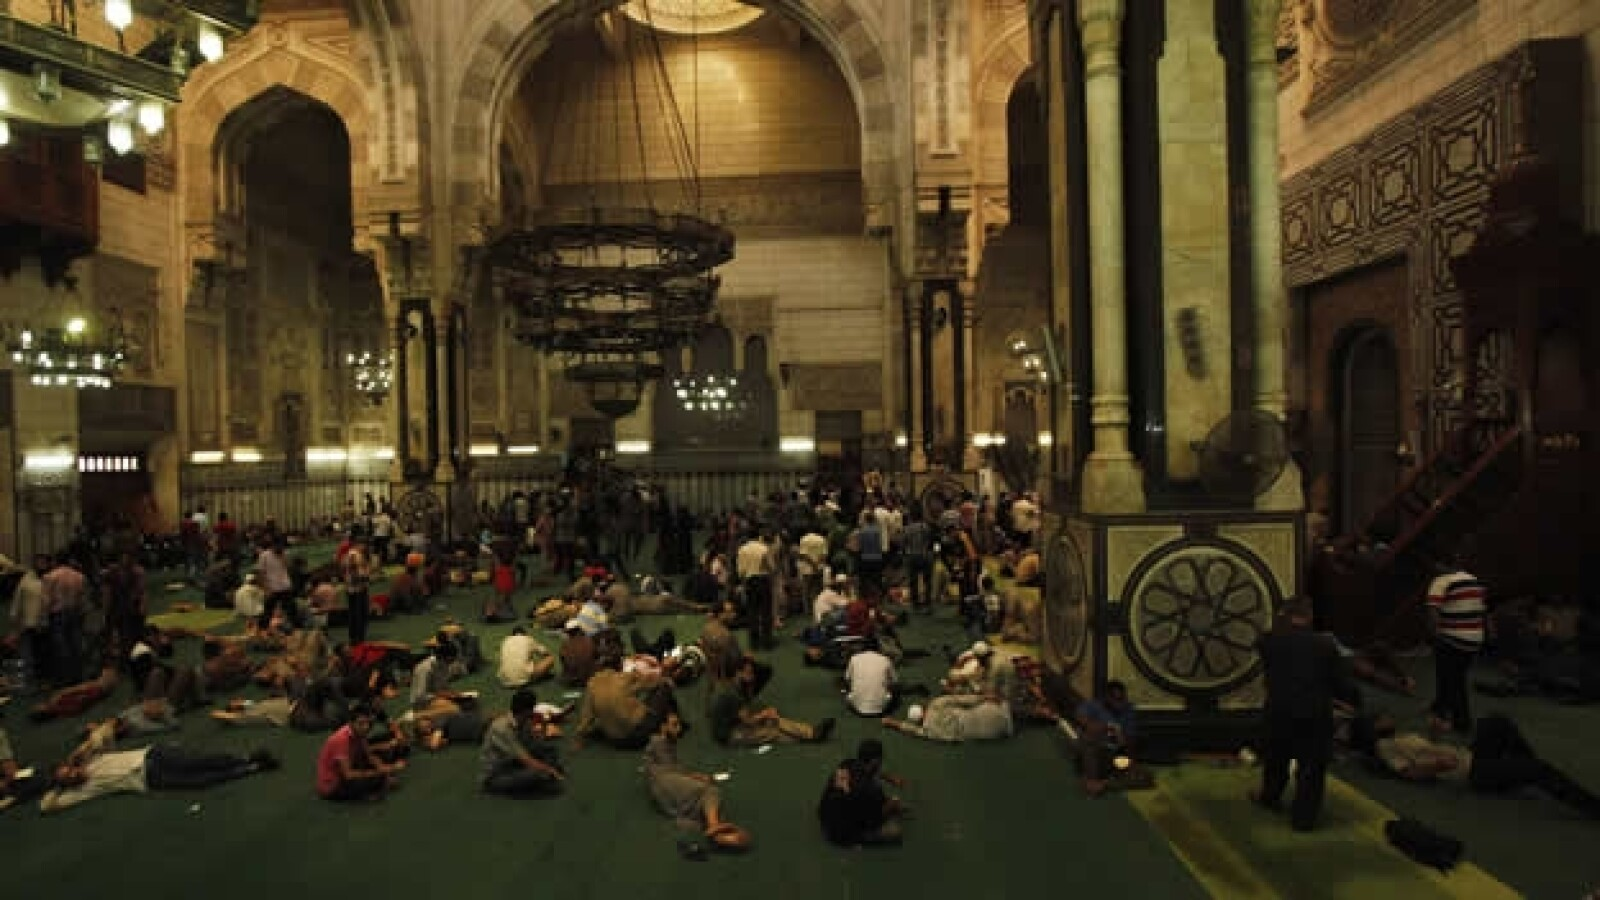 Egipto al Fateh mezquita 3